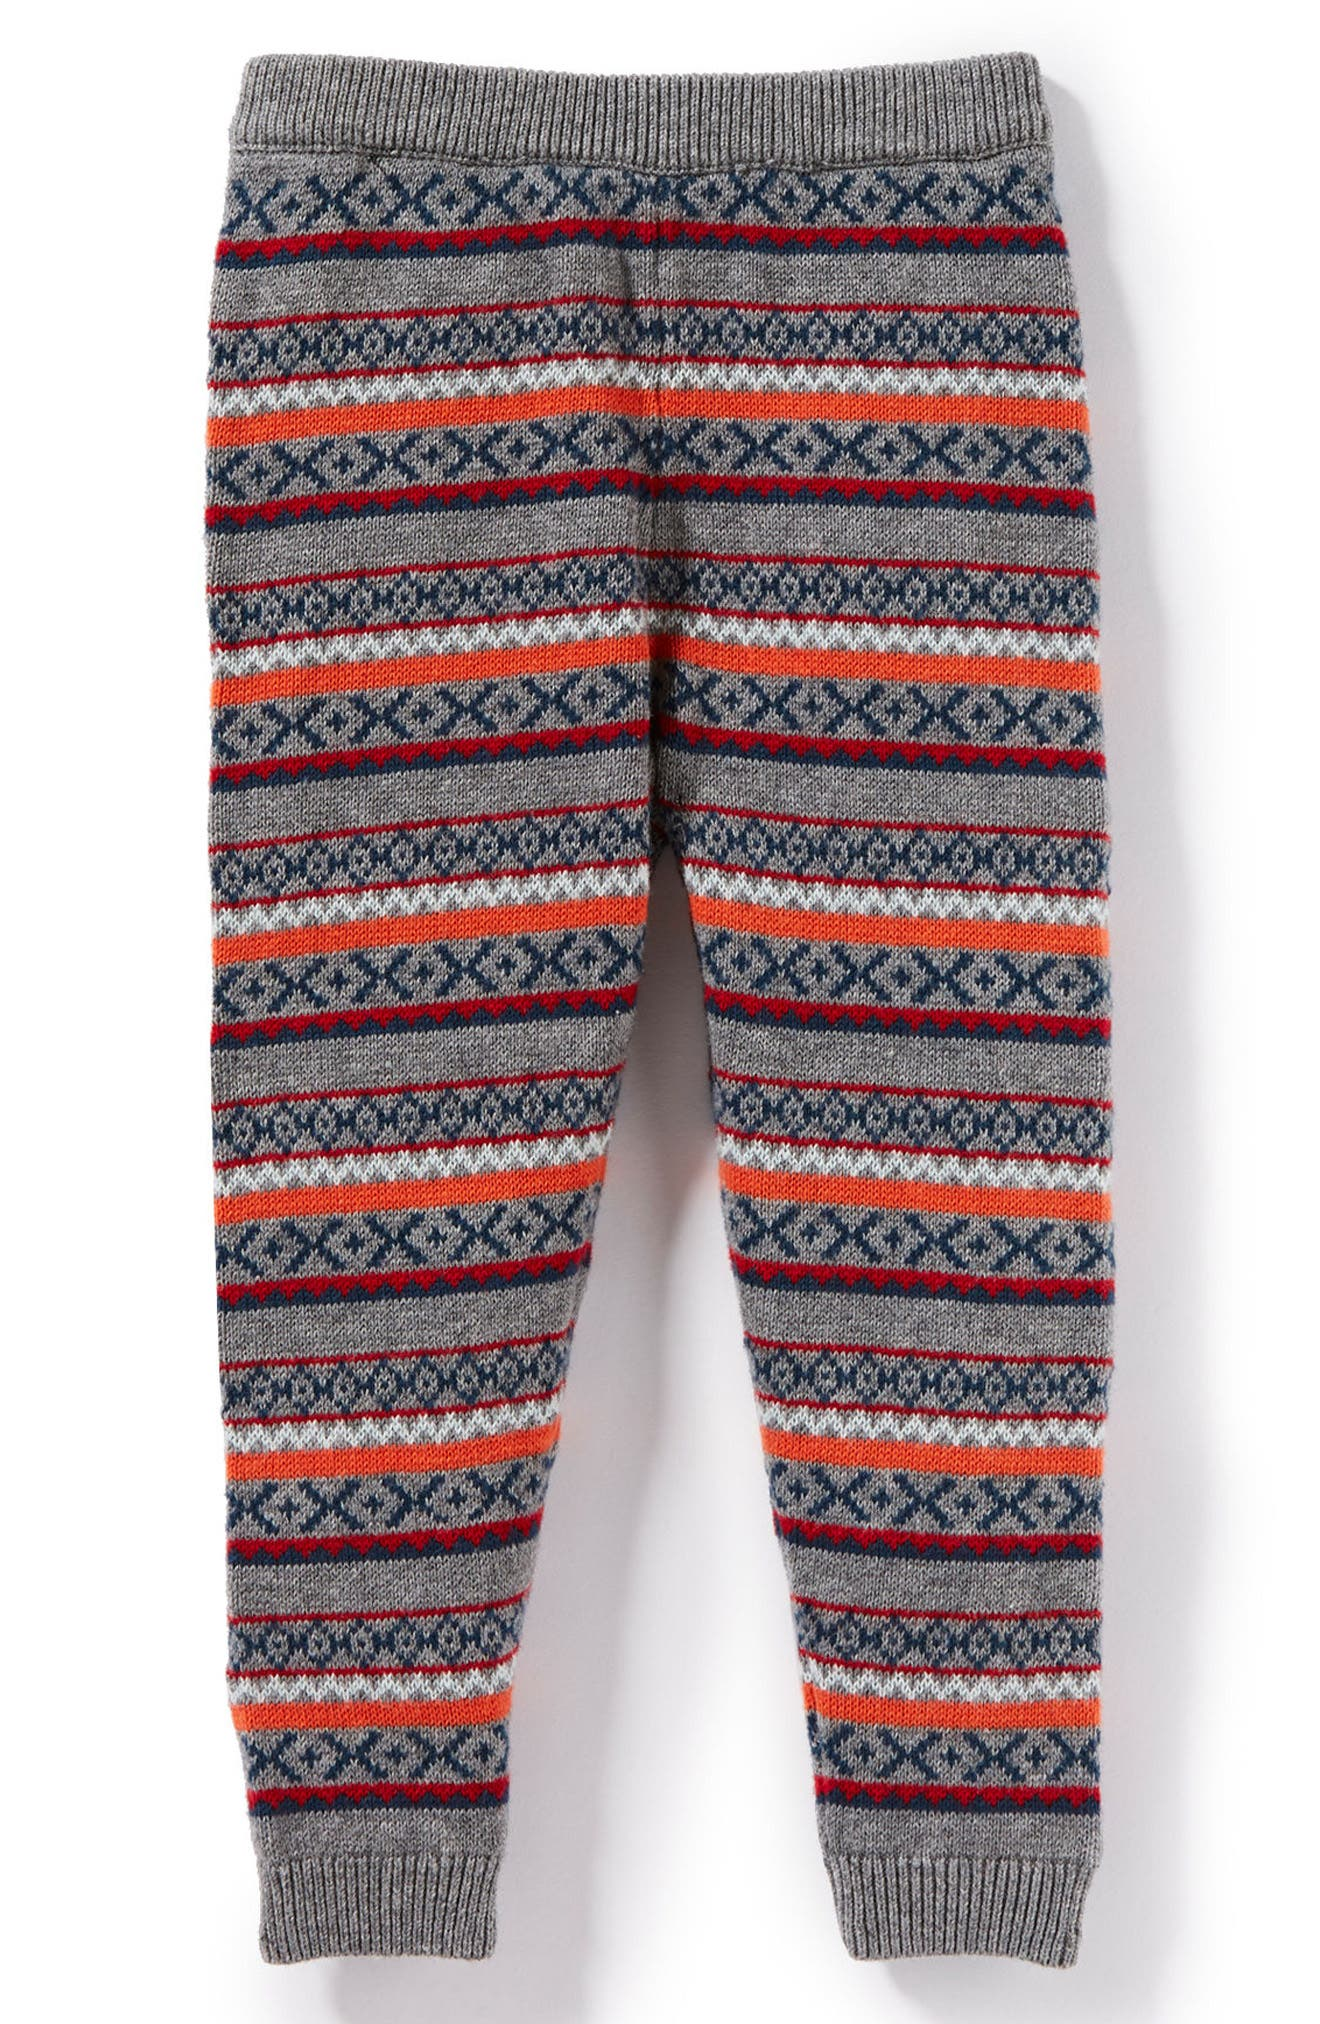 Alternate Image 1 Selected - Peek Eli Intarsia Sweater Pants (Baby Boys)